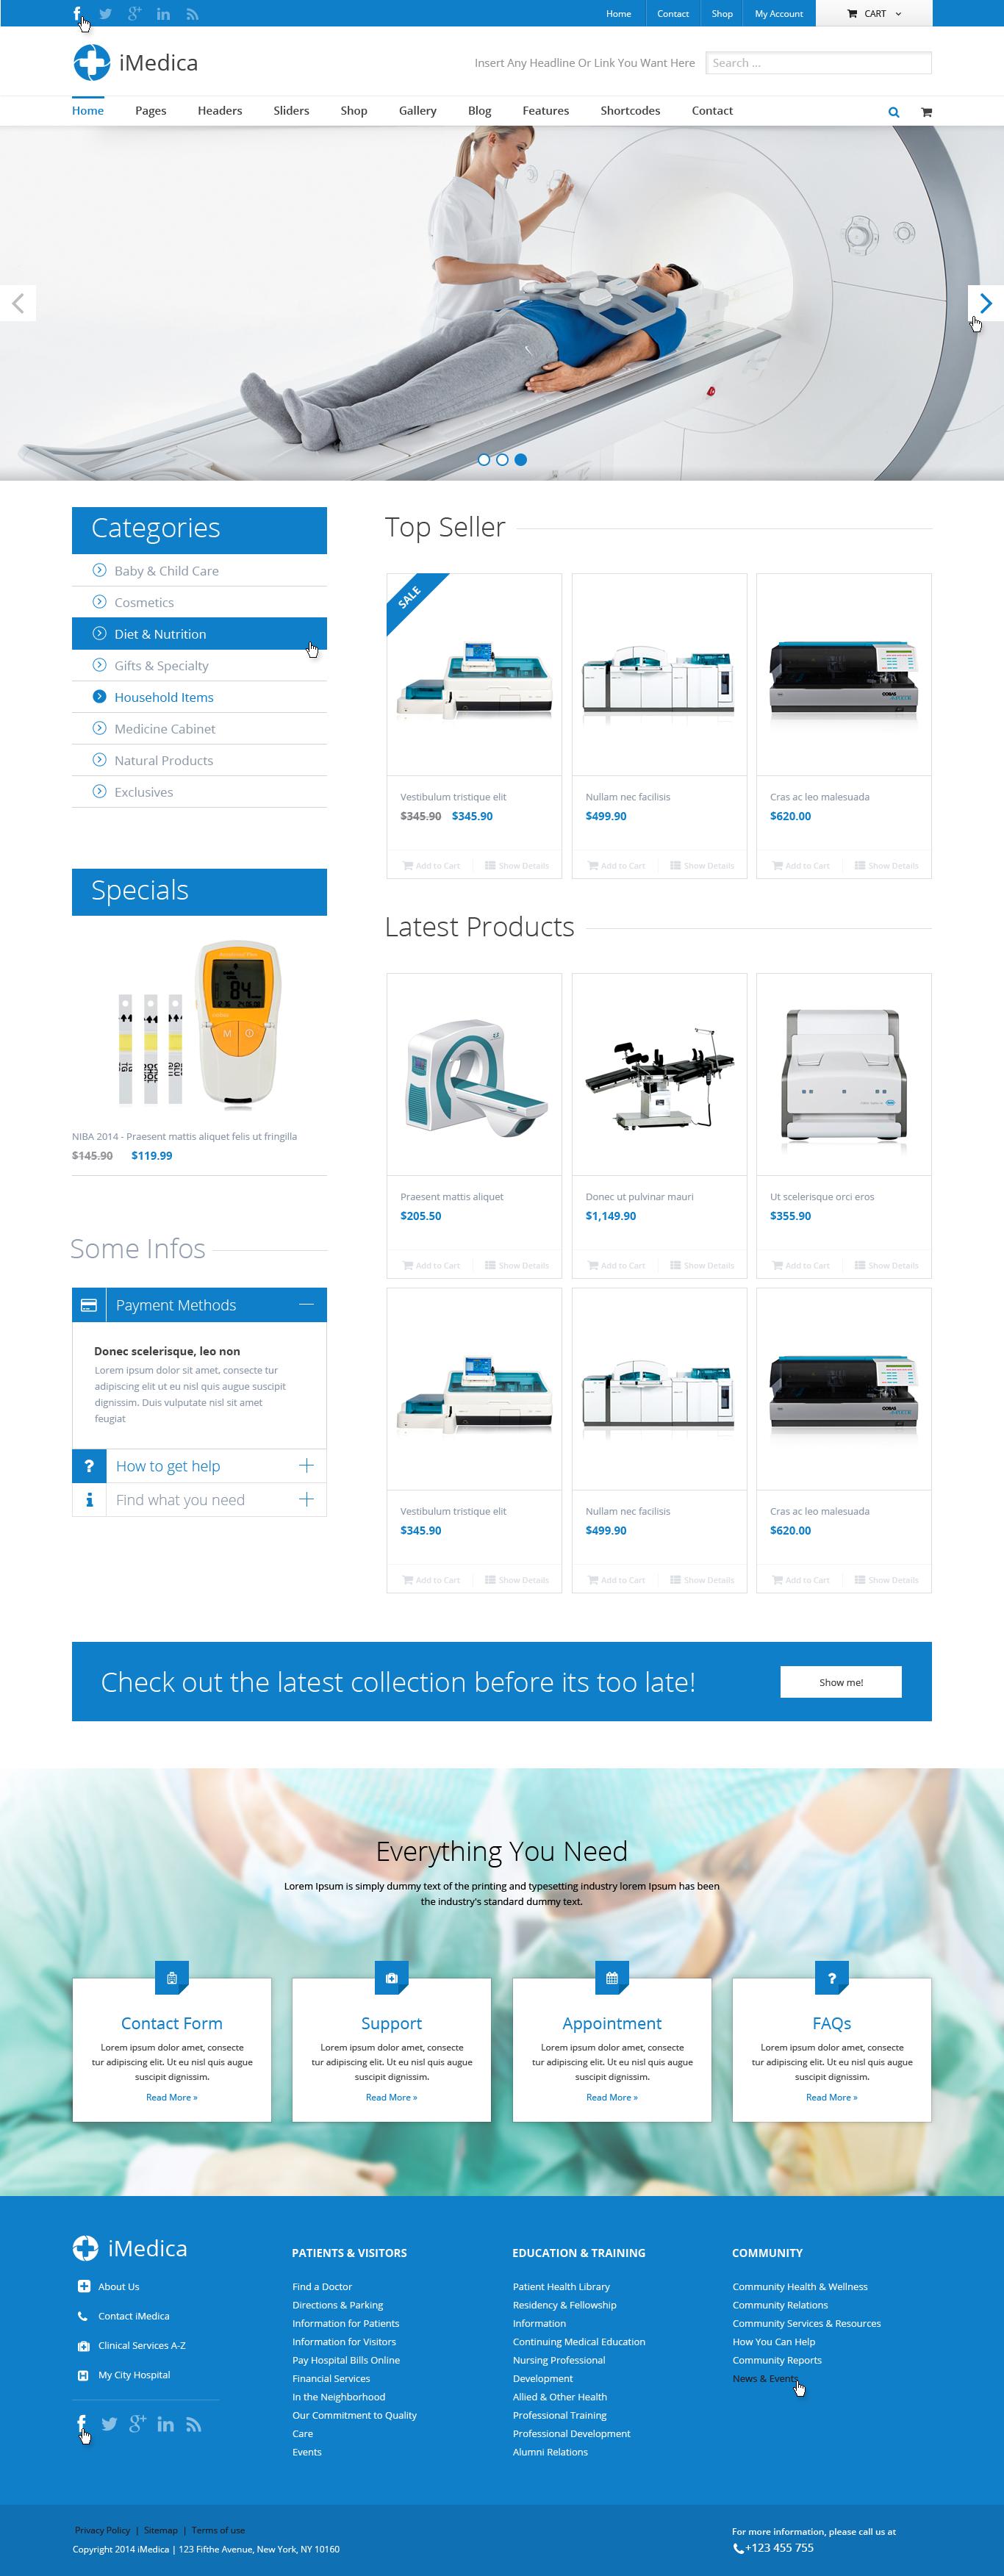 iMedica - Flat, Responsive Medical & Health Theme